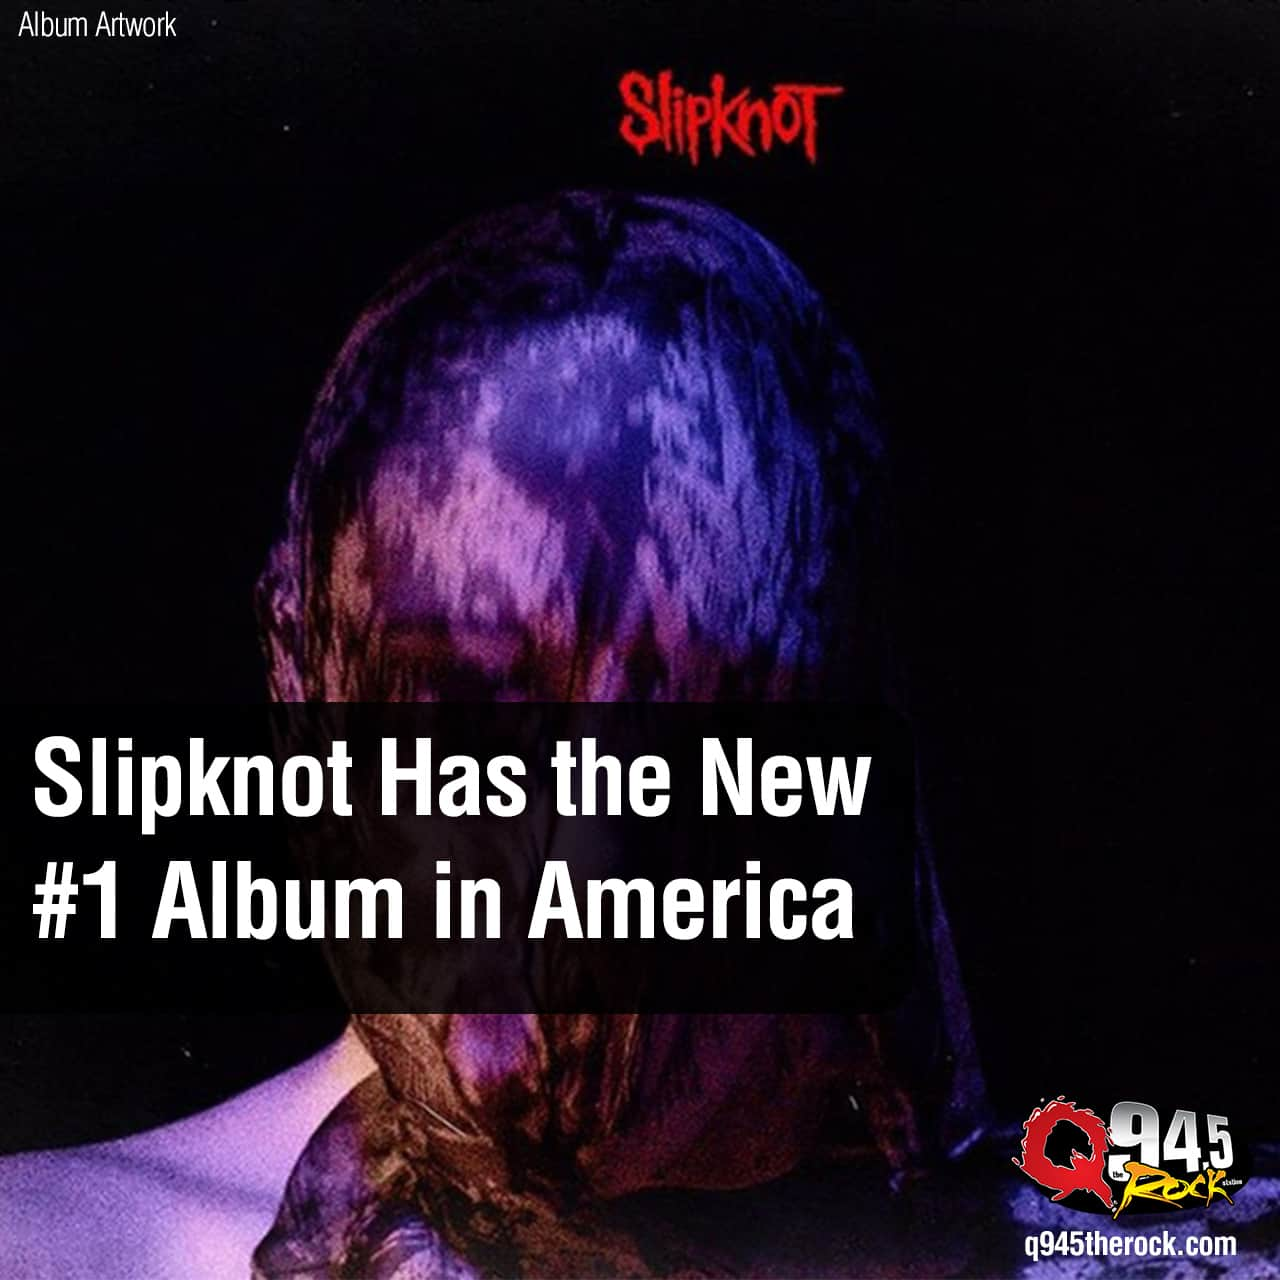 Slipknot Has the New #1 Album in America